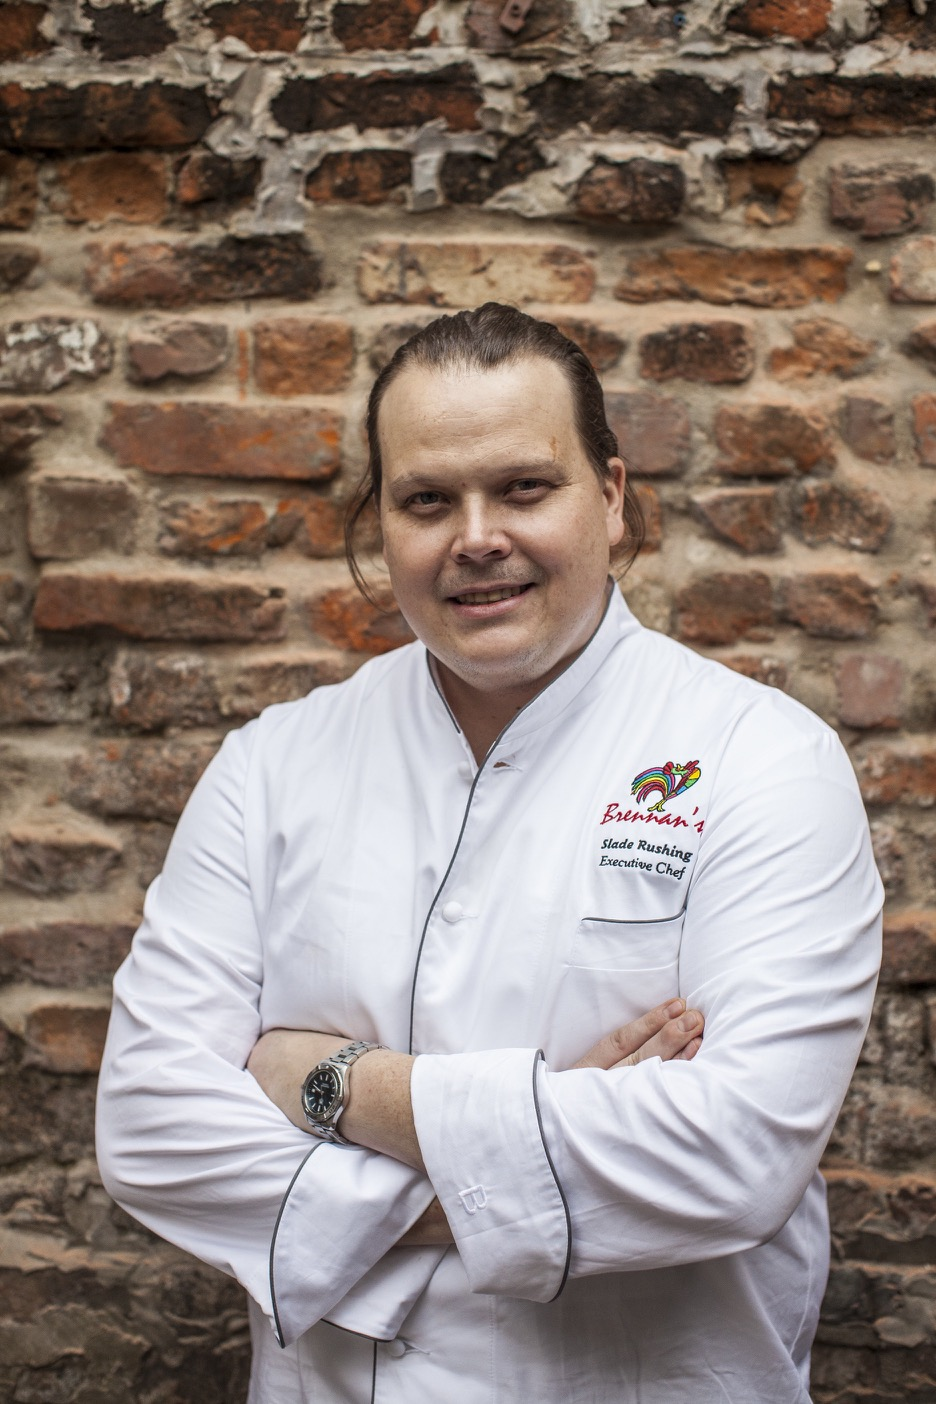 Executive Chef Slade Rushing (photo: courtesy of Brennan's)